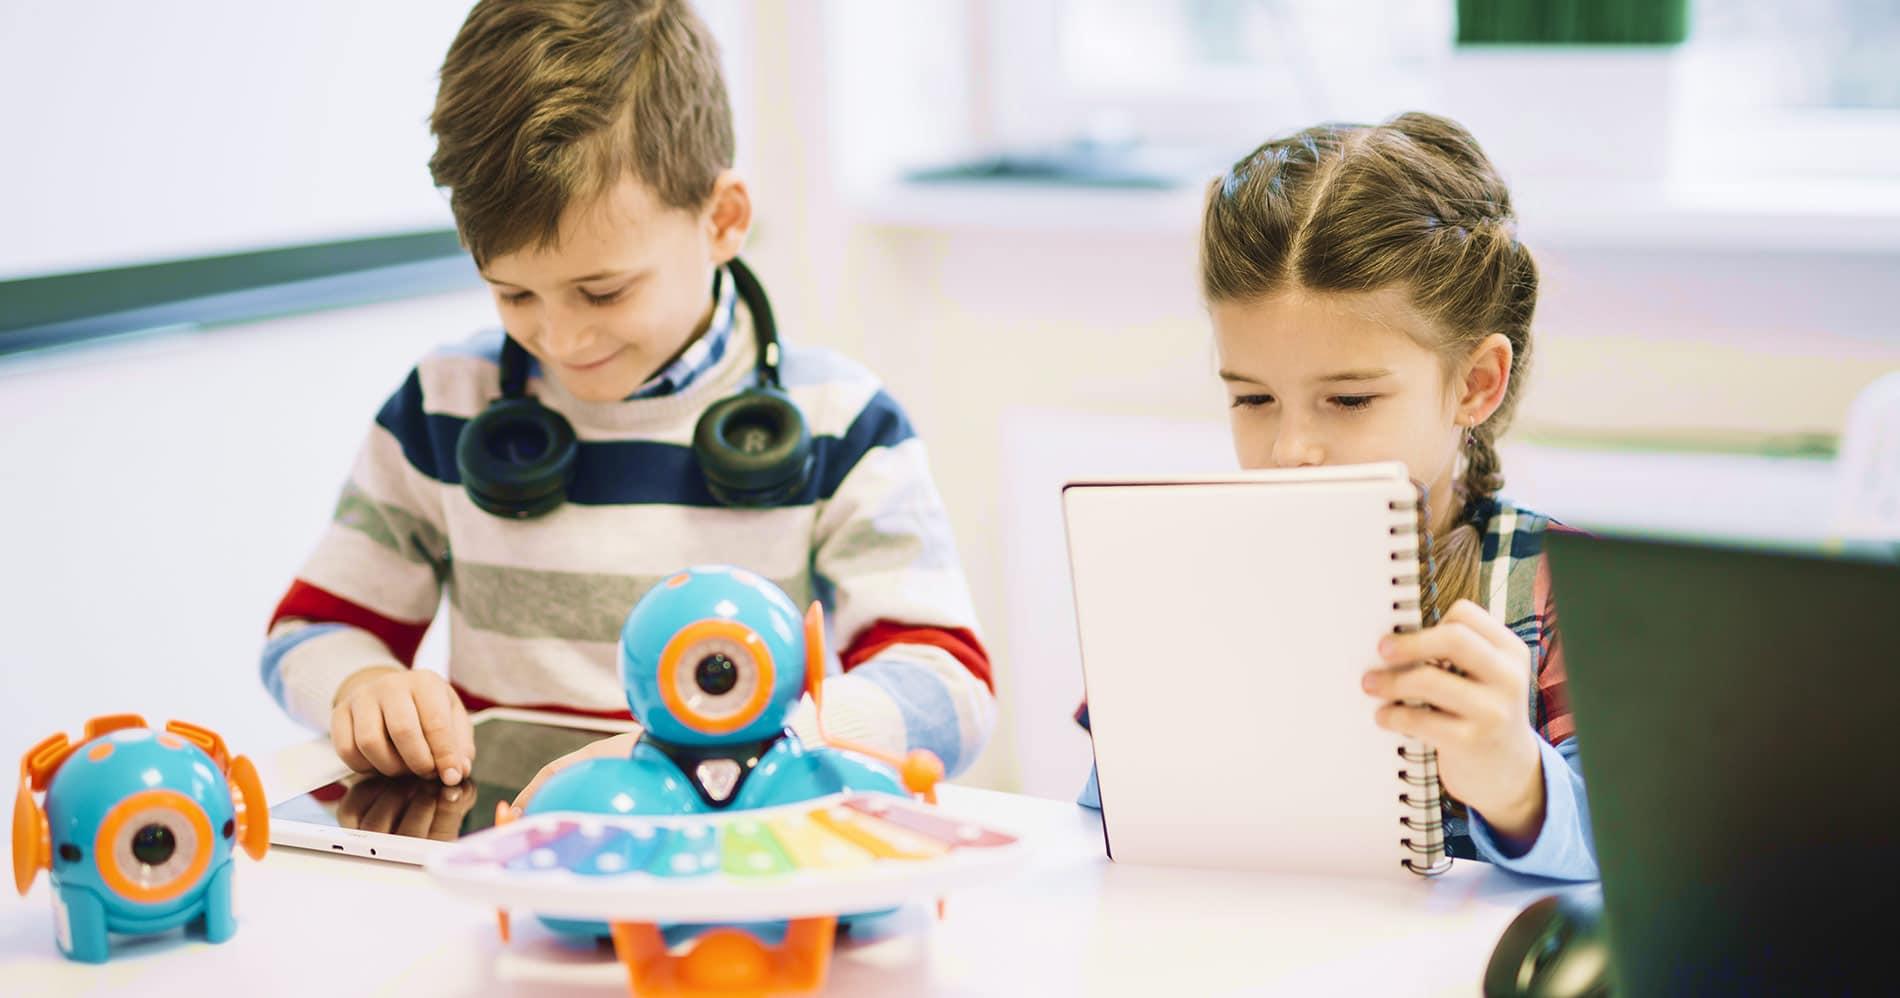 bambini giochi robot informatica